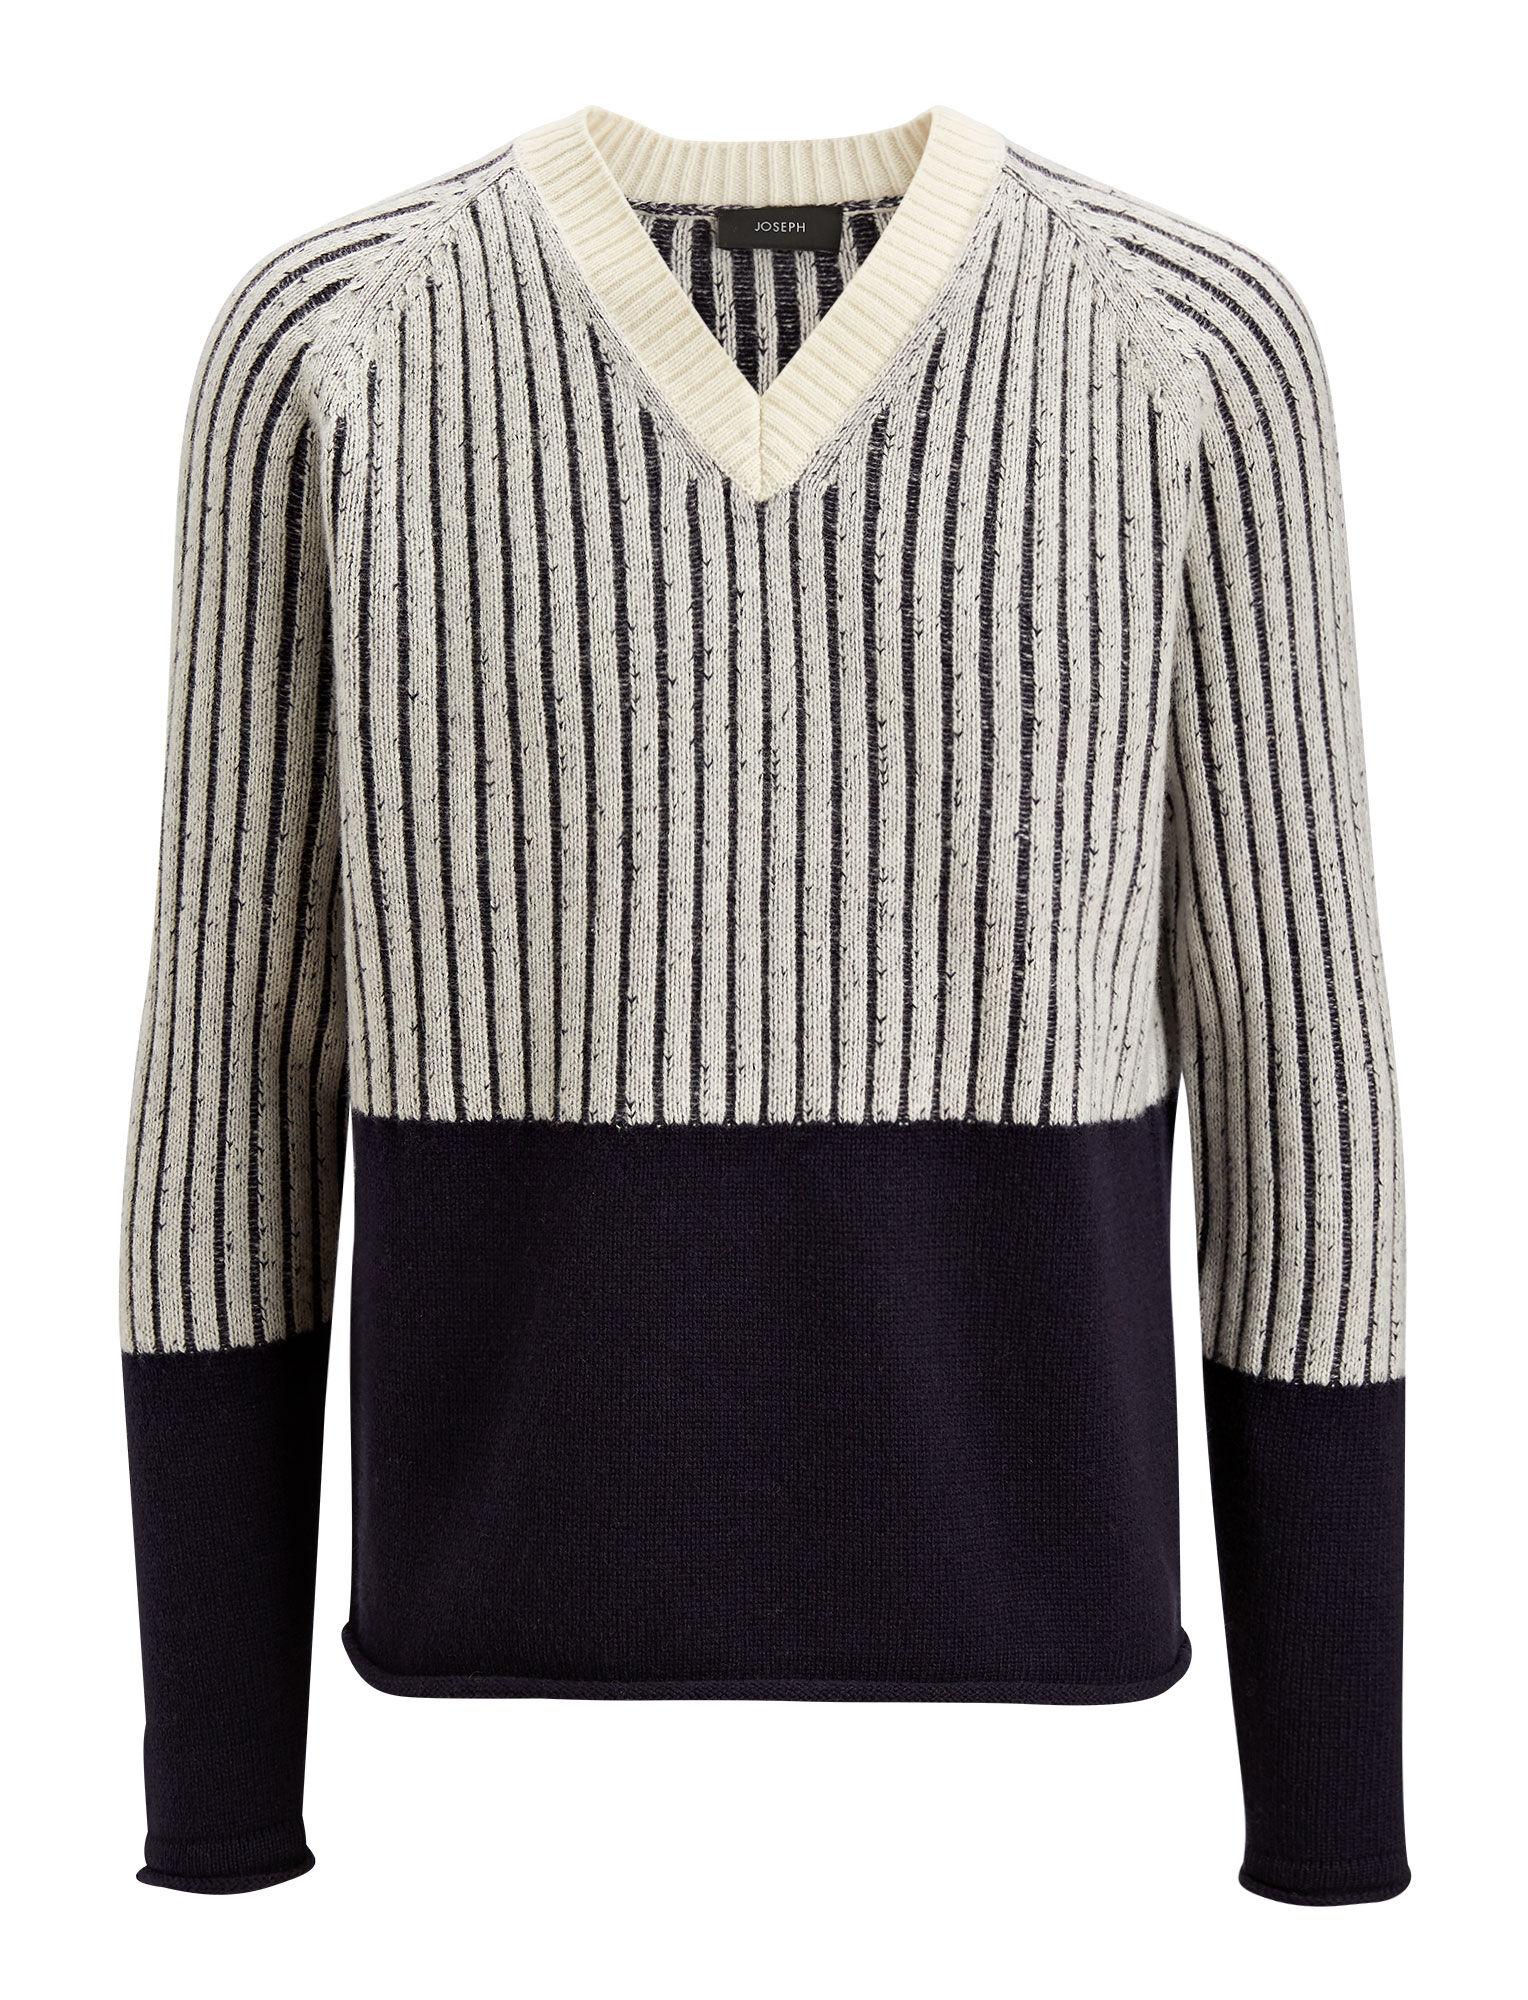 Joseph, V Neck Soft Wool Block Knit, in ECRU/NAVY